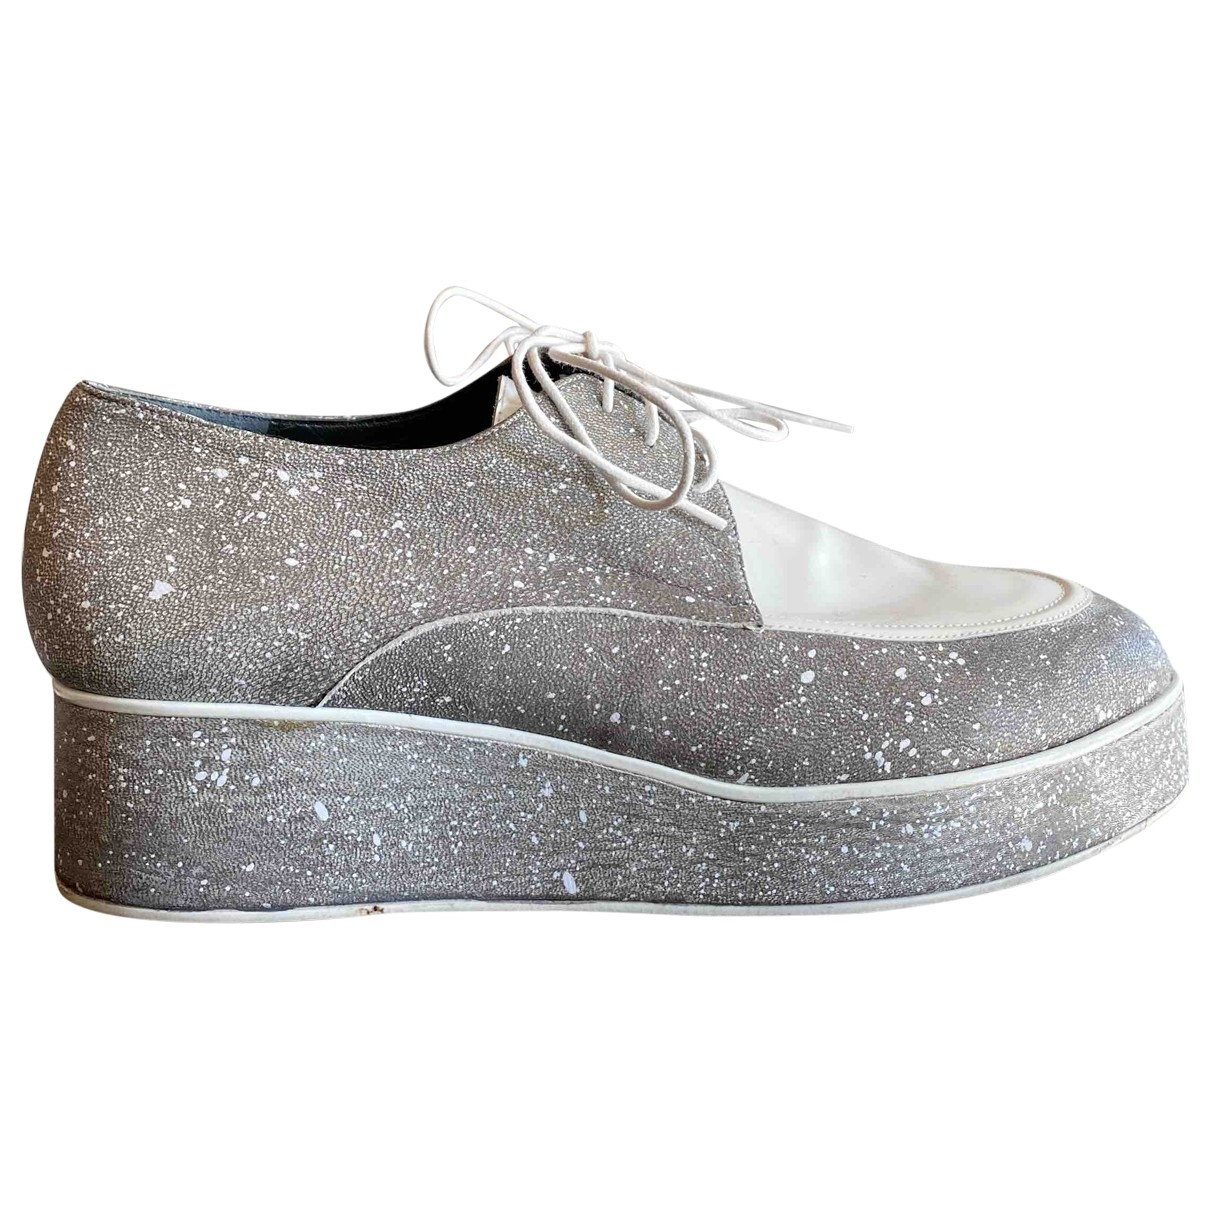 Amélie Pichard \N Grey Leather Lace ups for Women 39.5 EU